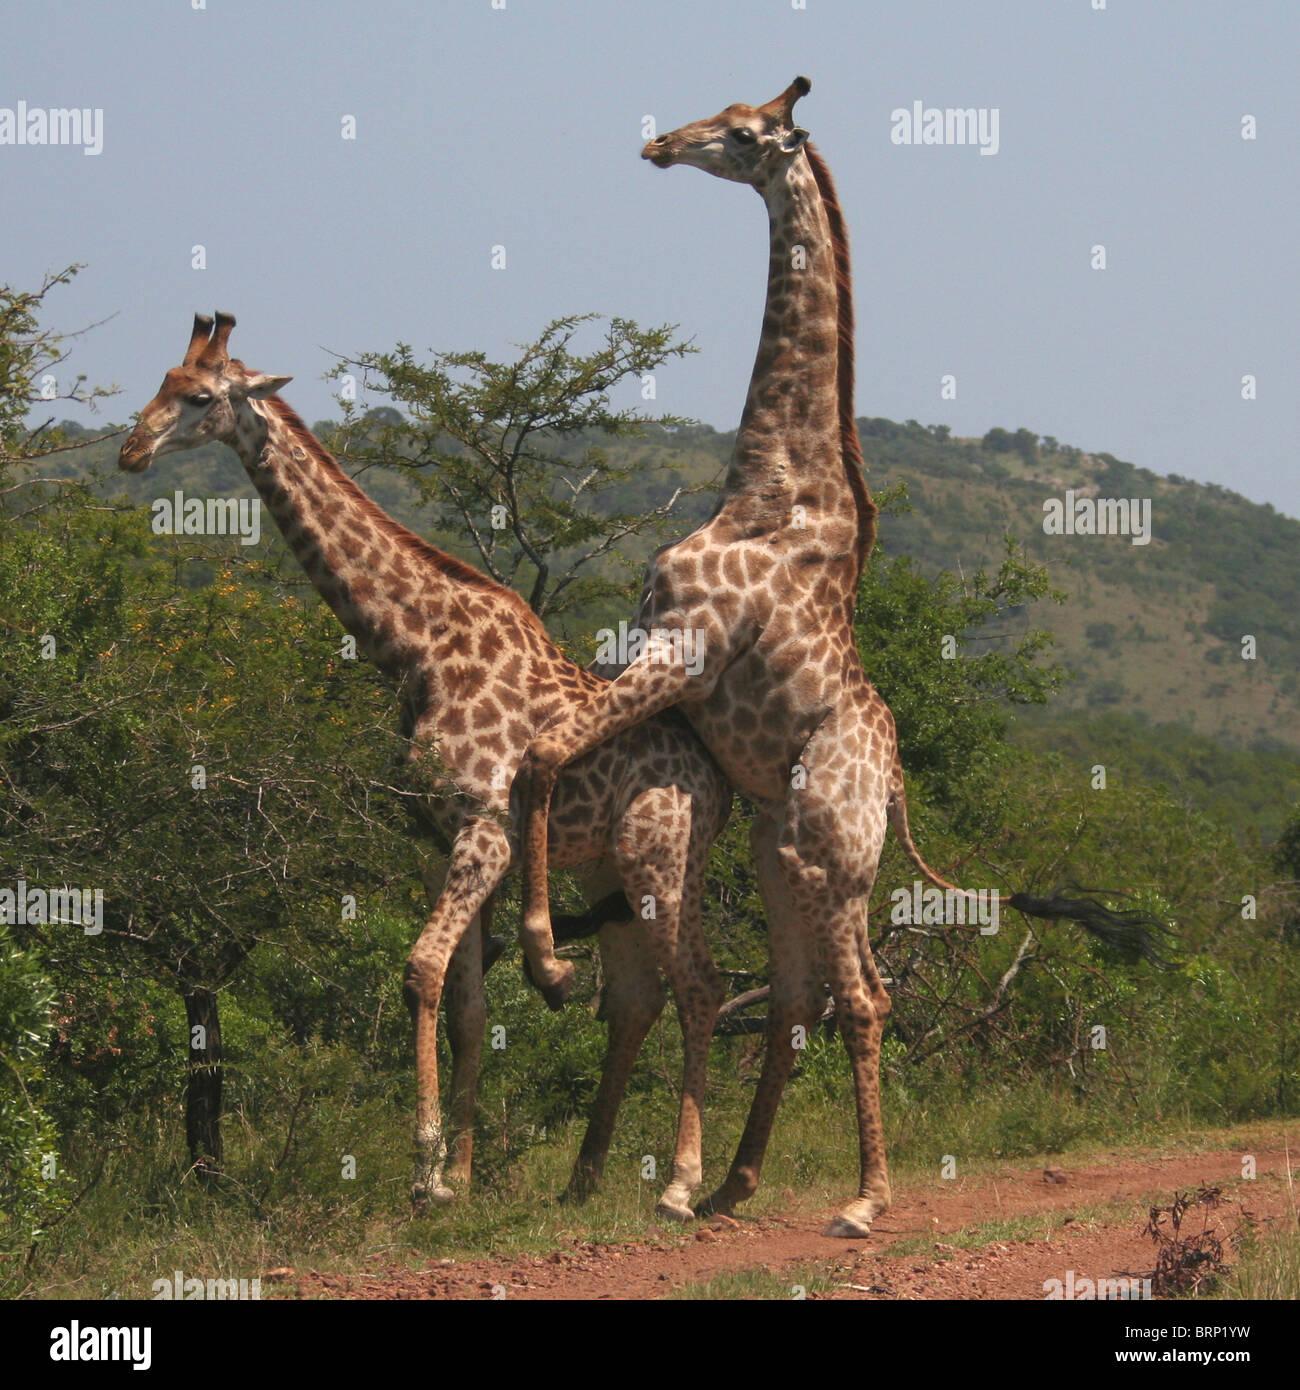 male giraffe mounting a female giraffe stock photo royalty free image